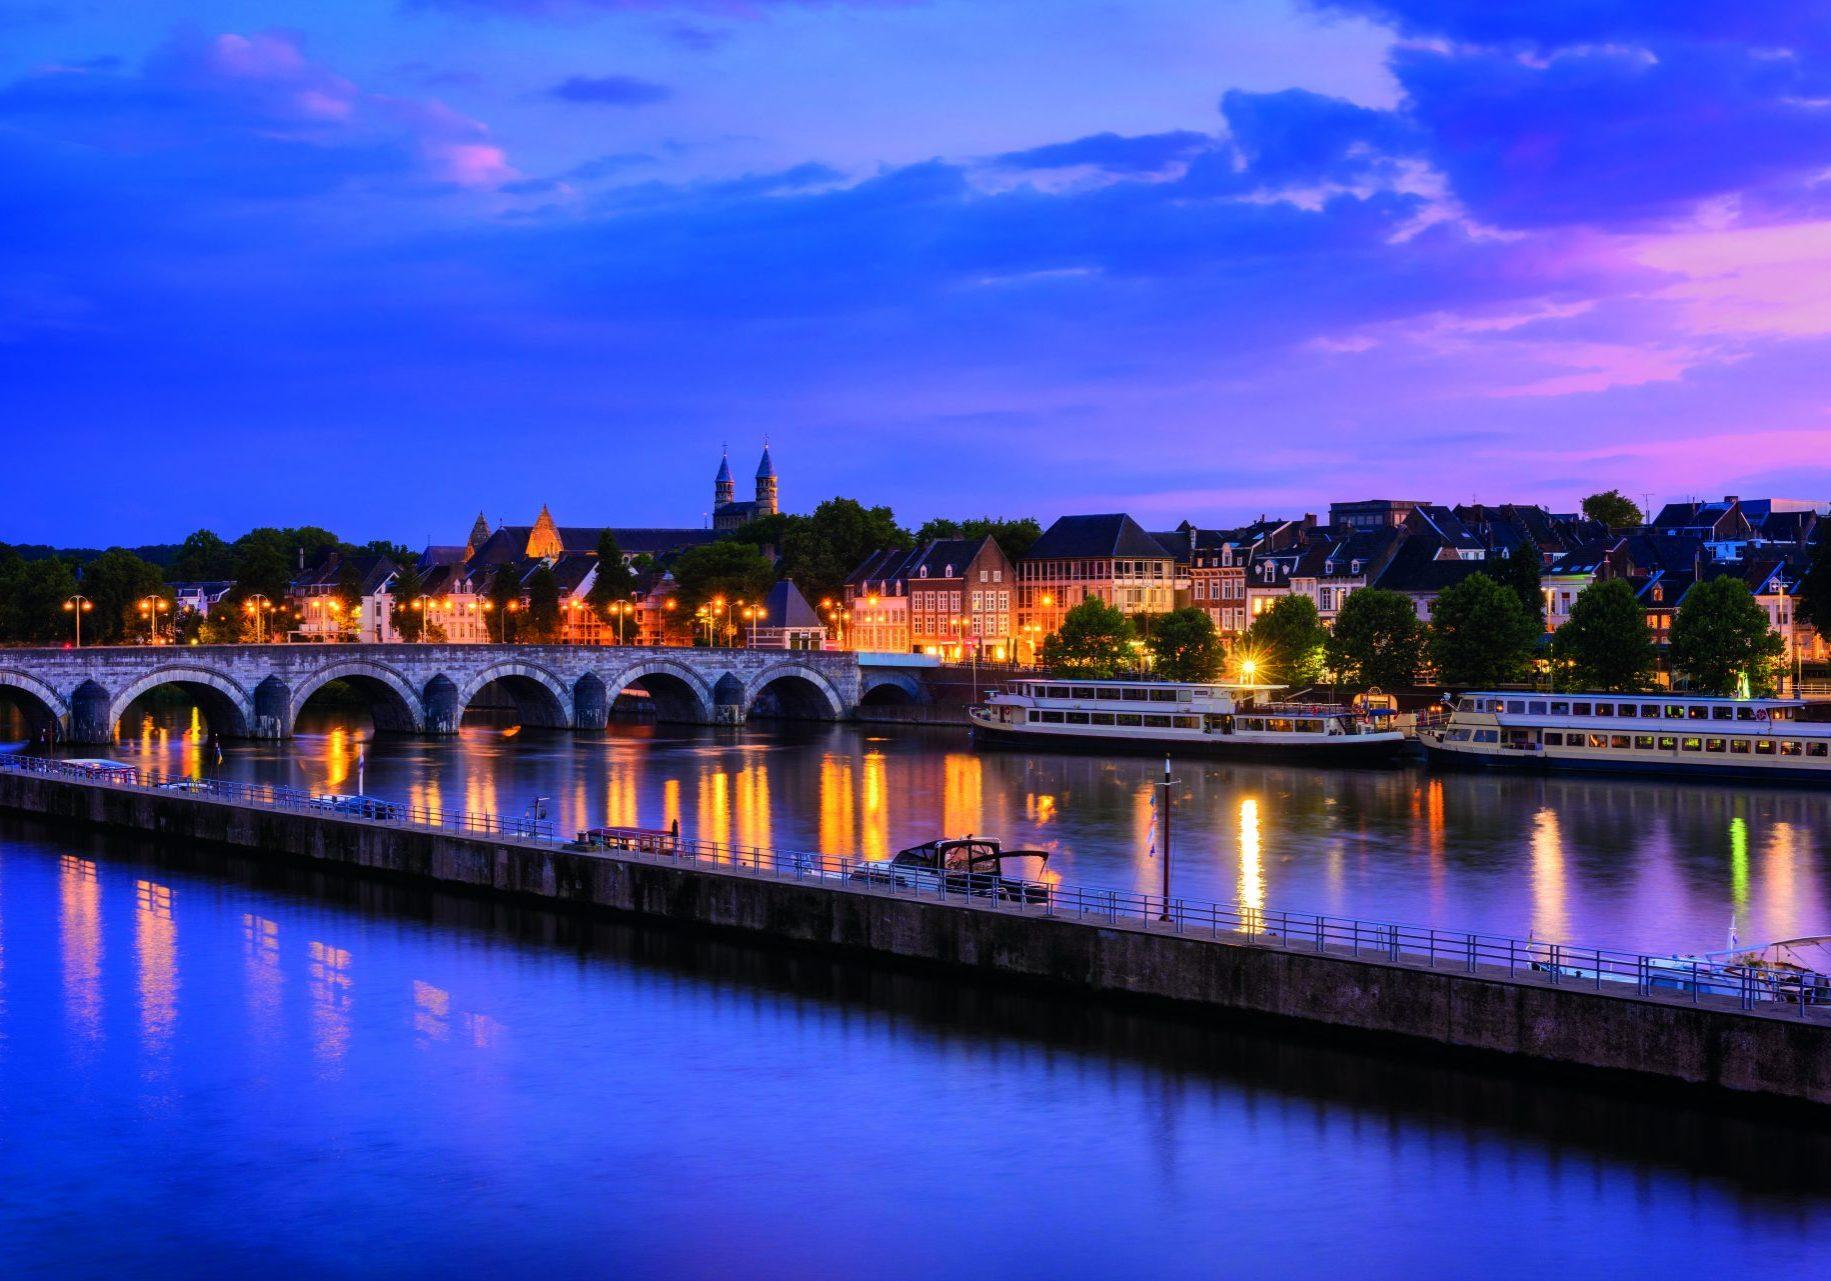 Sint Servaasbrug (St. Servatius Bridge) is an arched stone footbridge across the Maas (Meuse) River.